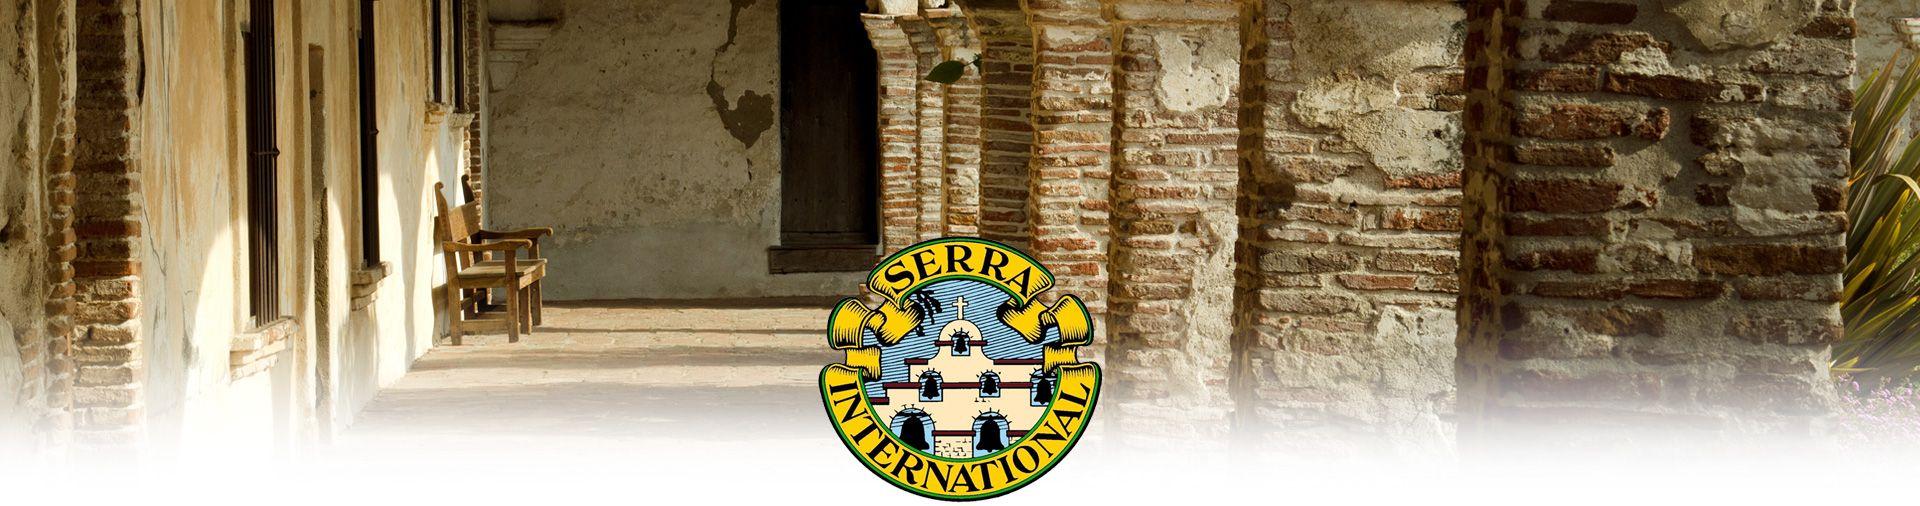 serra-banner_sub1.jpg